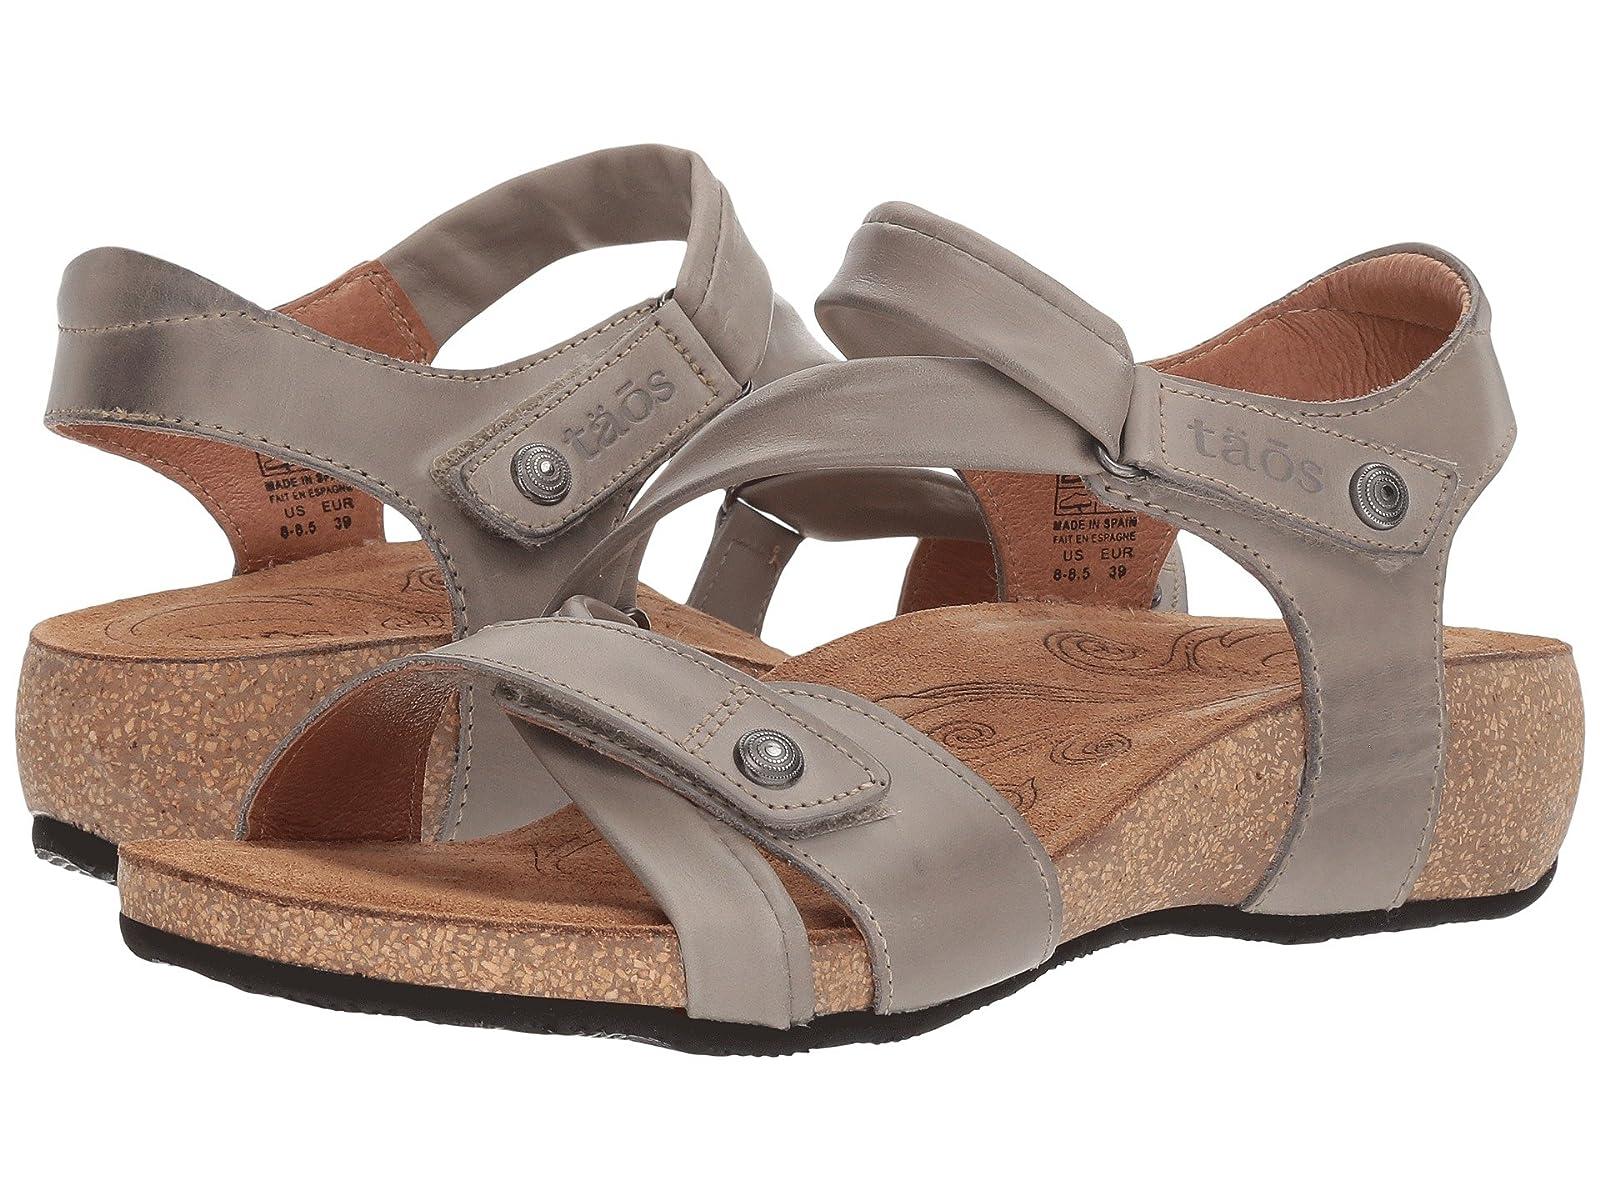 Taos Footwear UniverseAtmospheric grades have affordable shoes